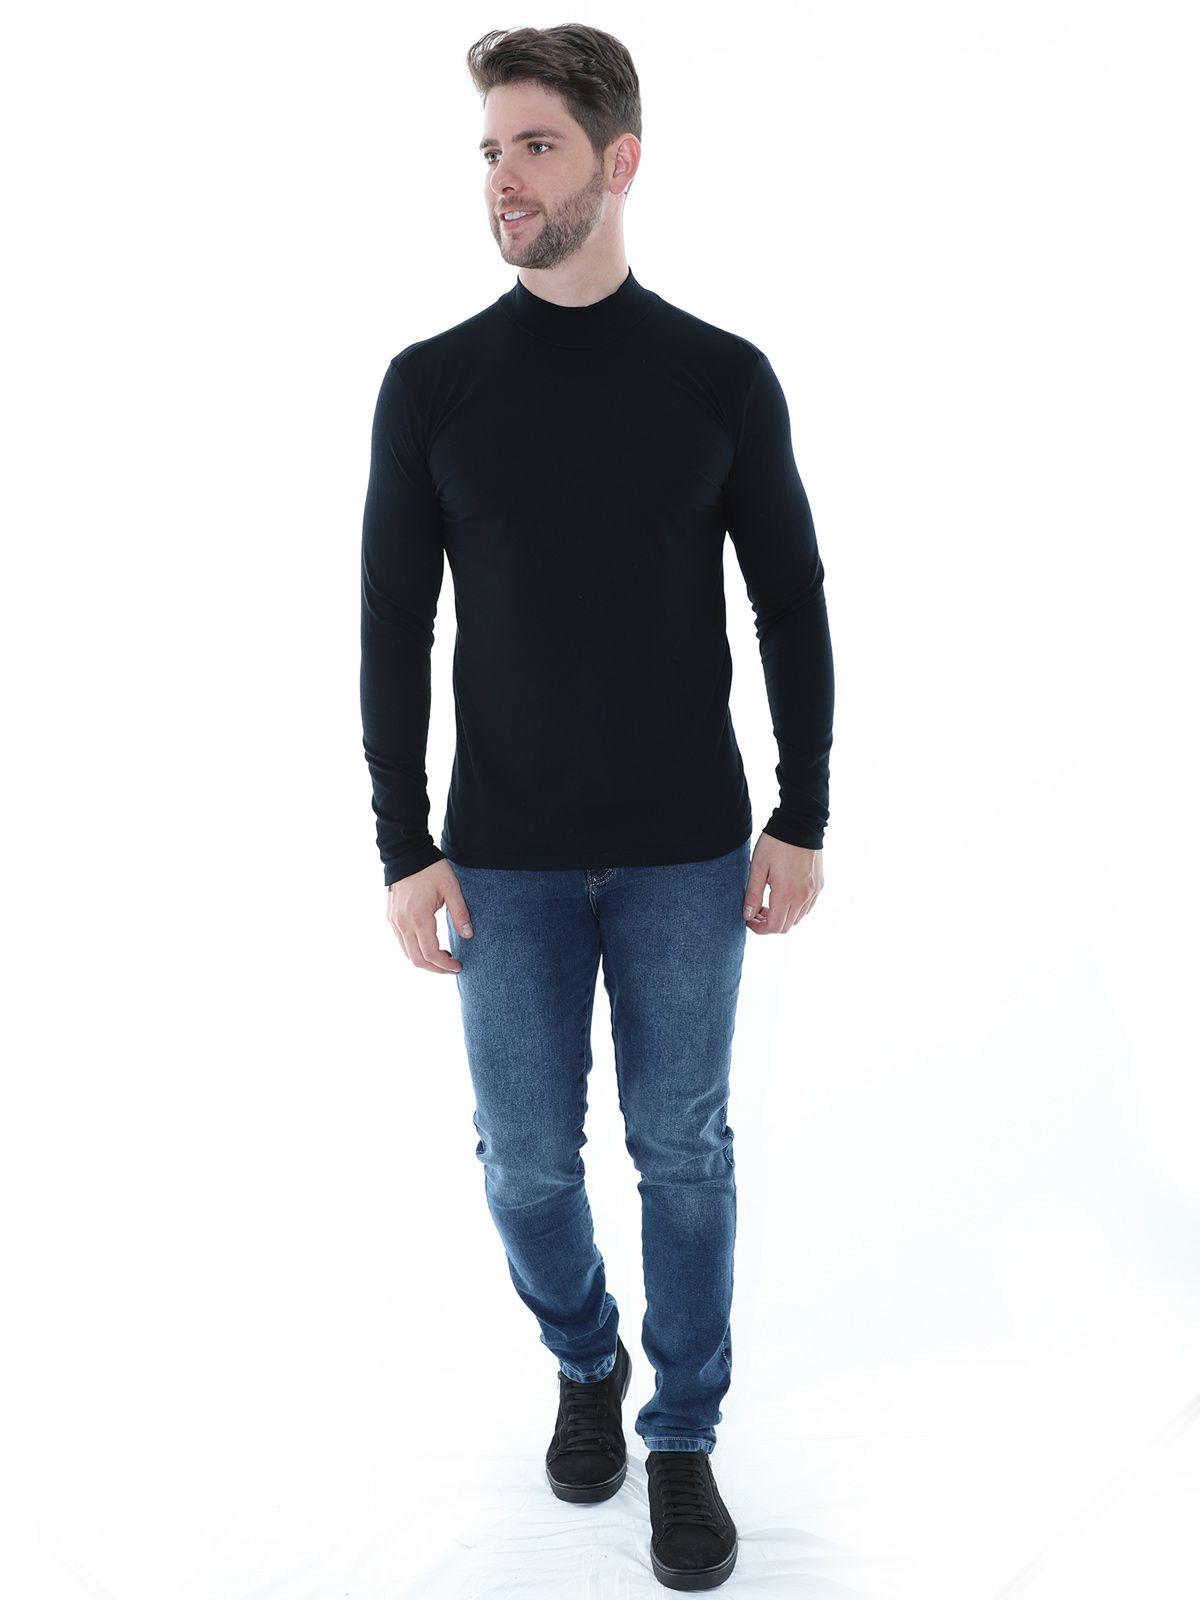 Blusa Masculina Anistia Gola Alta Slim com Elastano Preta